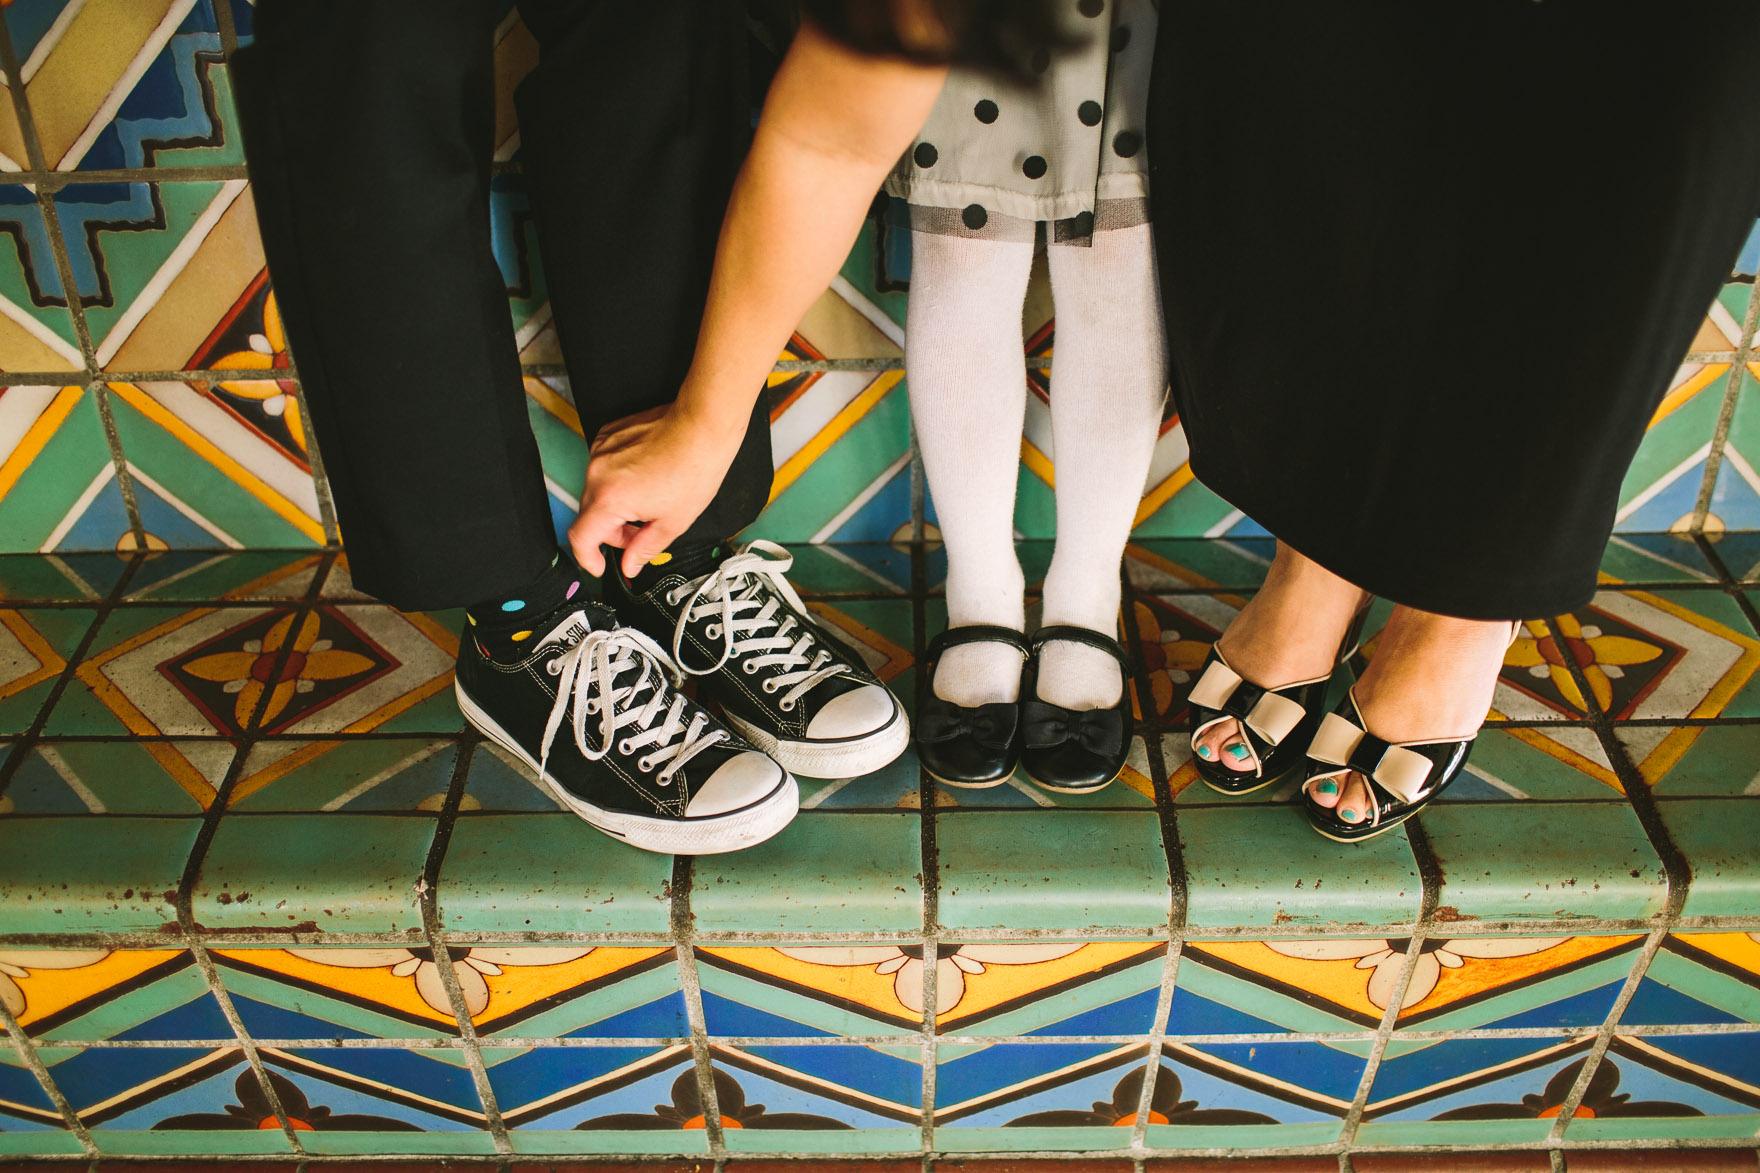 Vintage LA Family Frolic – Photo by Let's Frolic Together